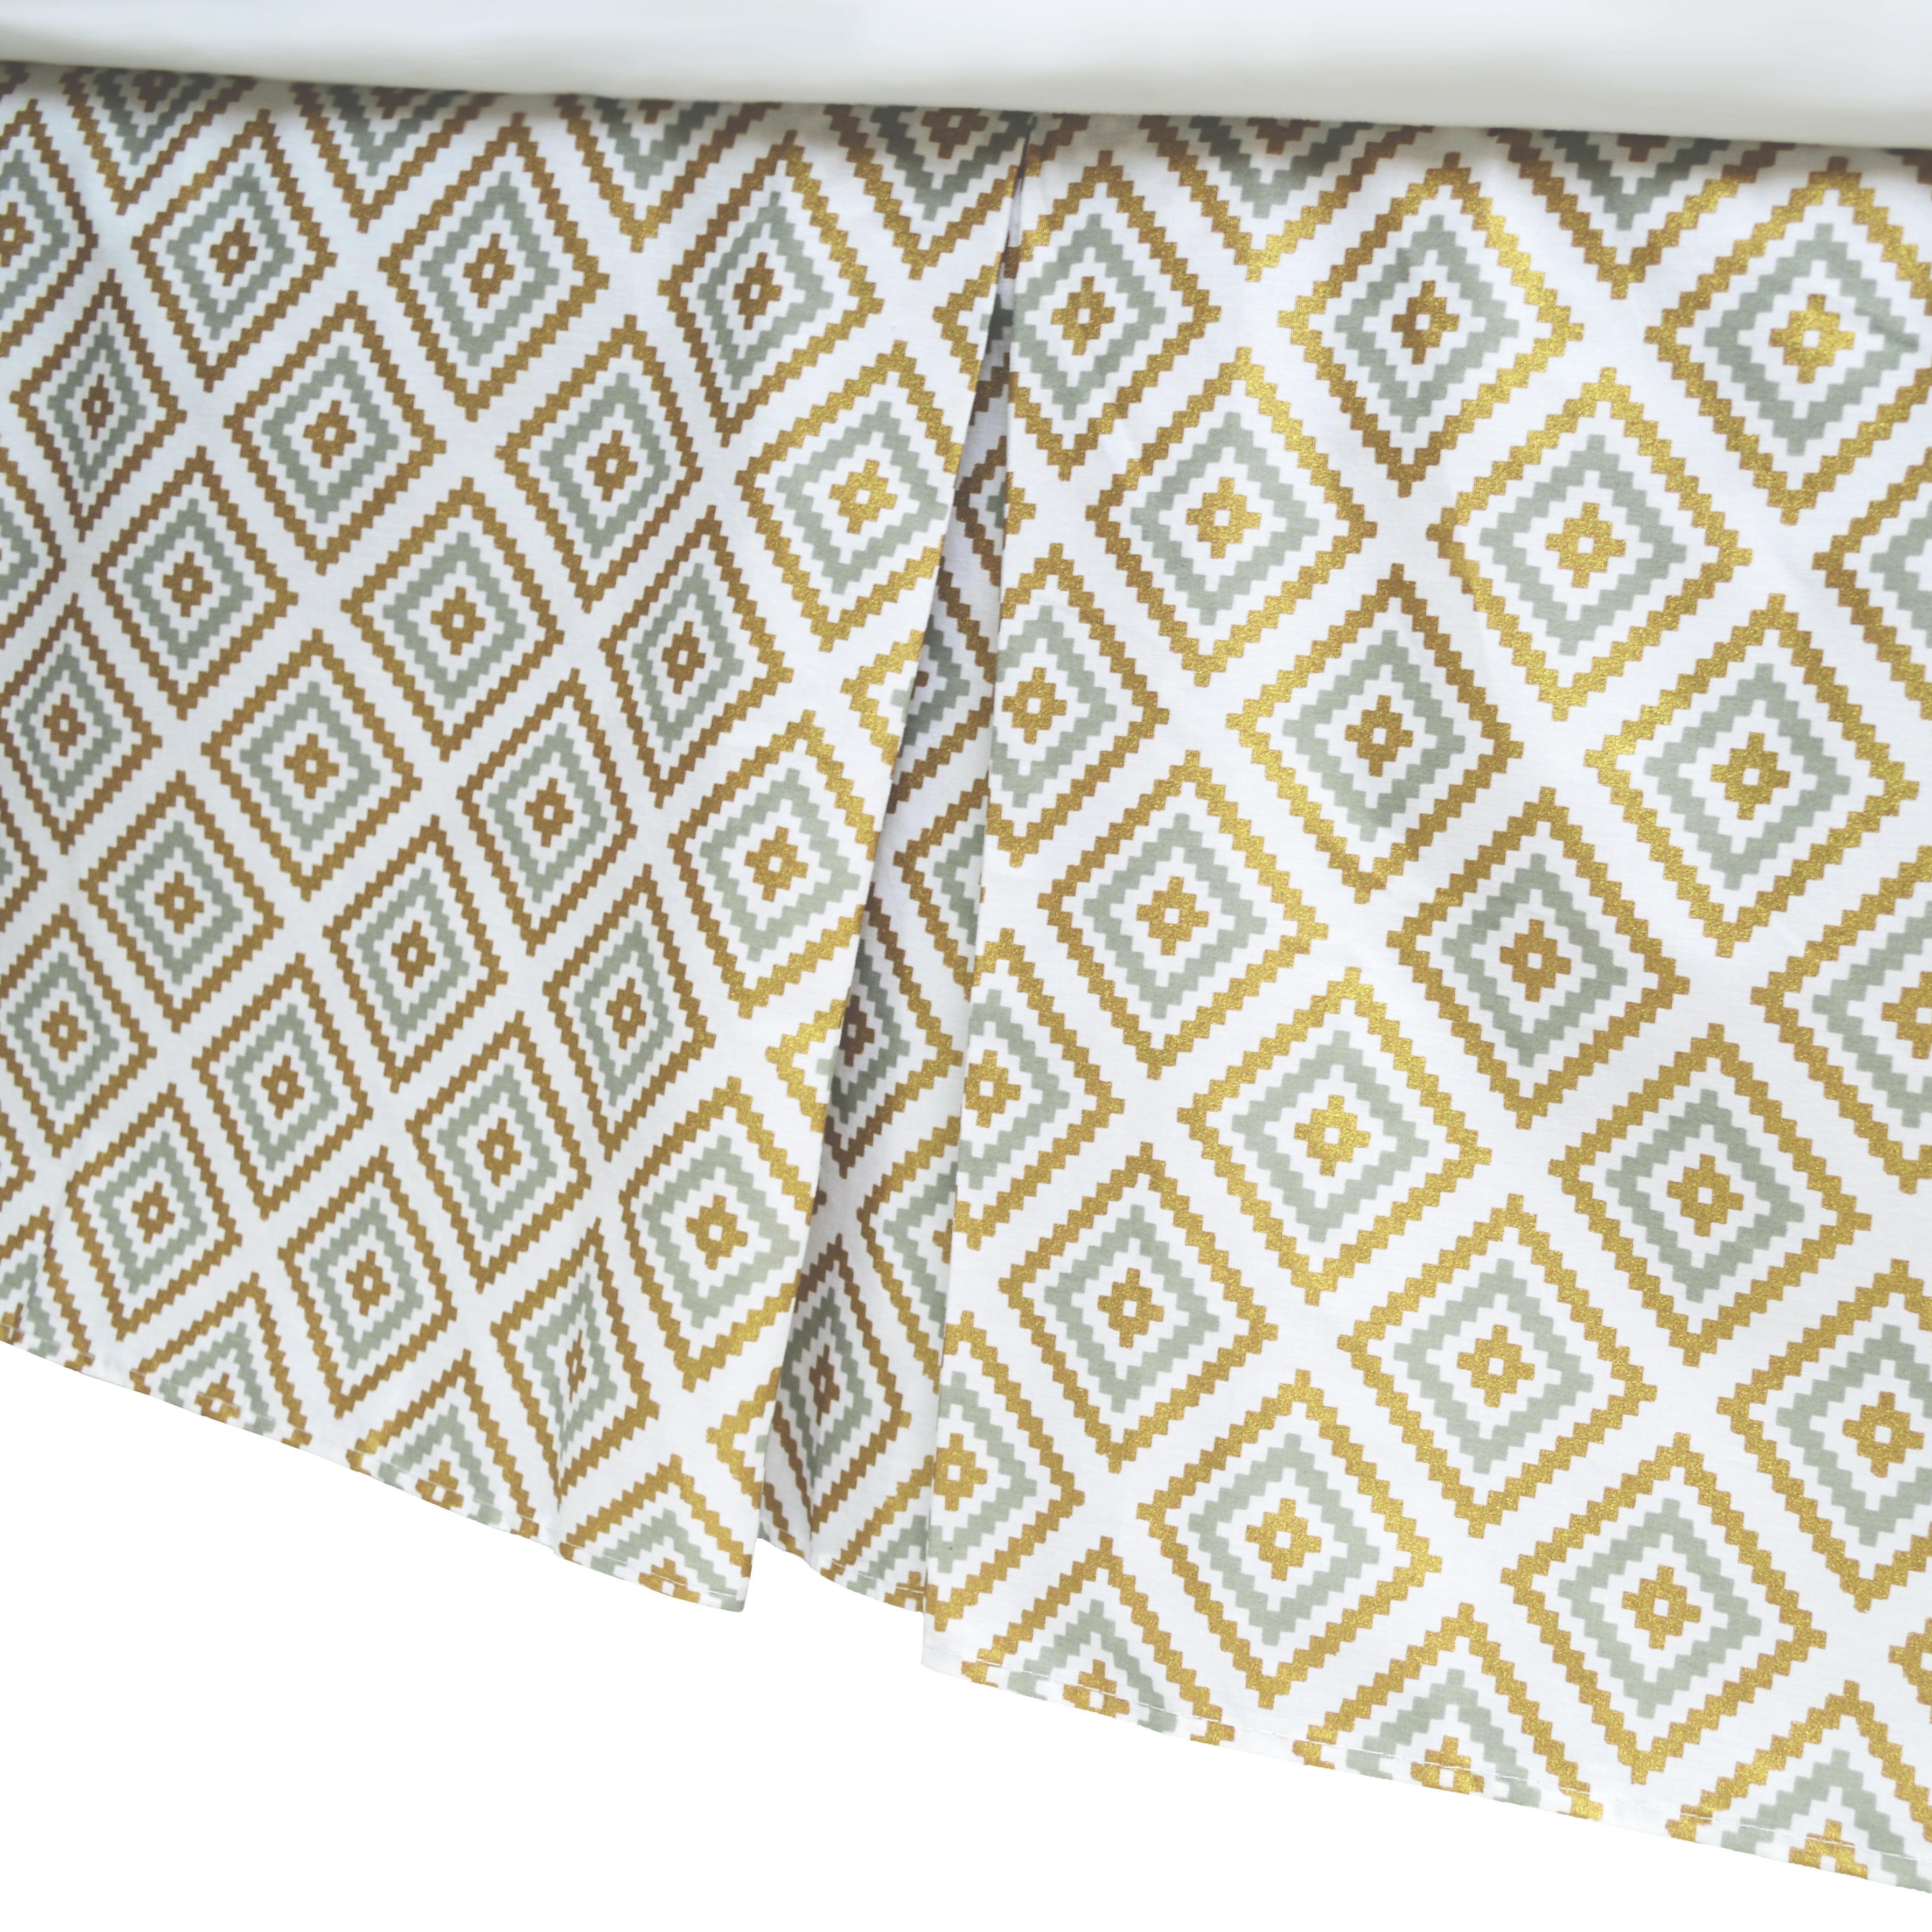 American Baby Company Crib Skirt, Sparkle Gold/Grey Kilim